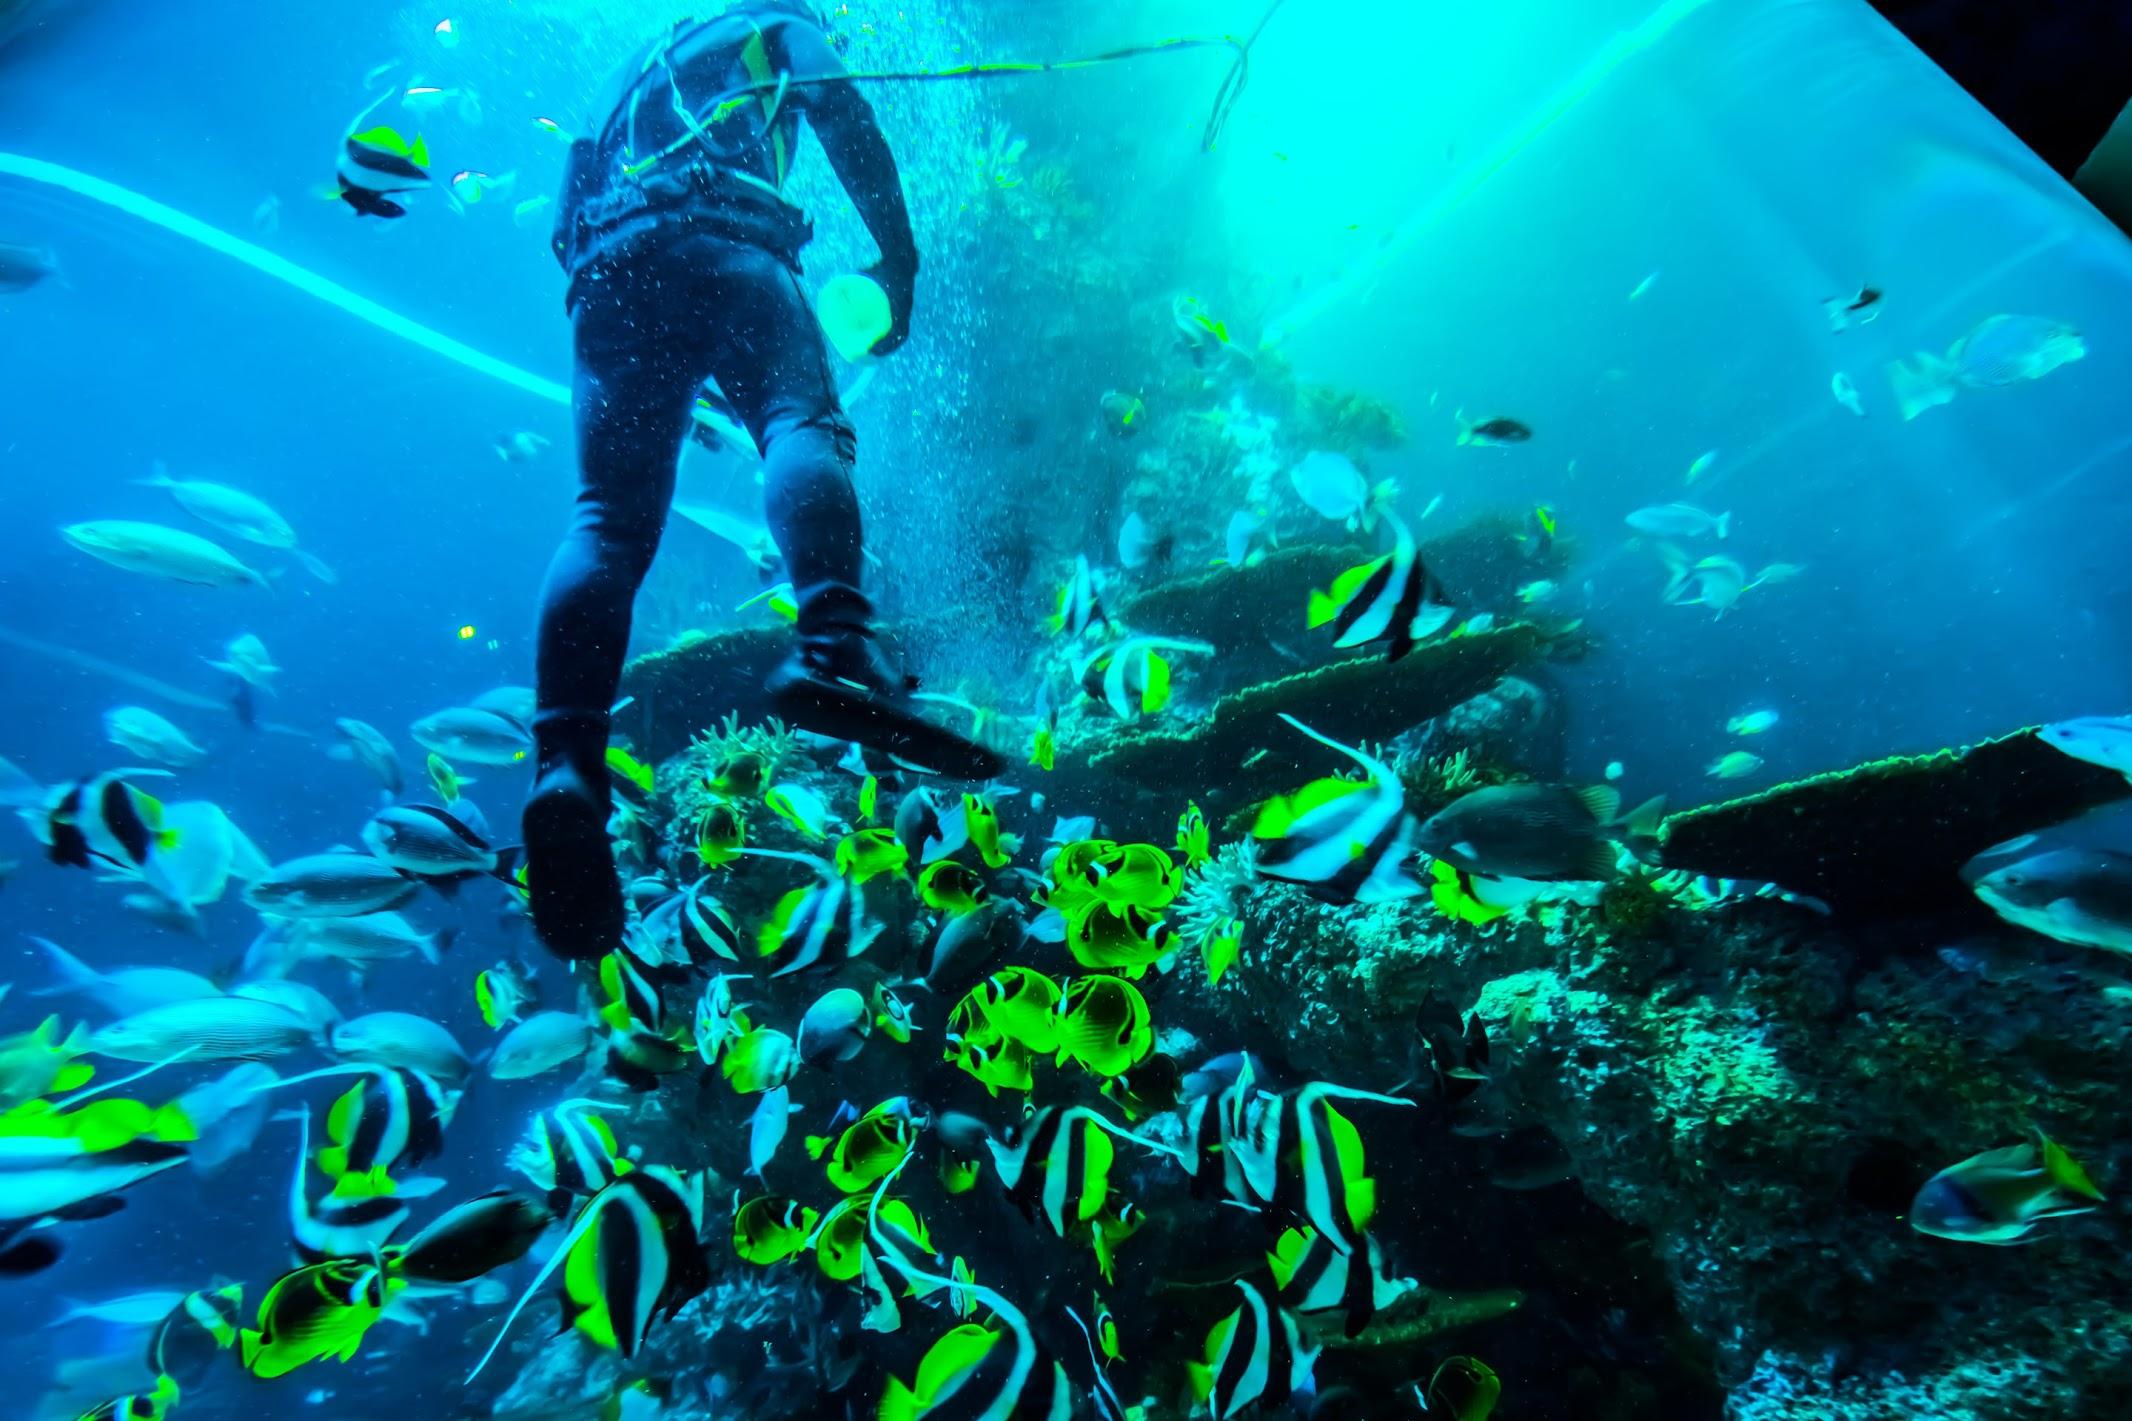 Singapore Sentosa S.E.A. Aquarium Coral Garden3